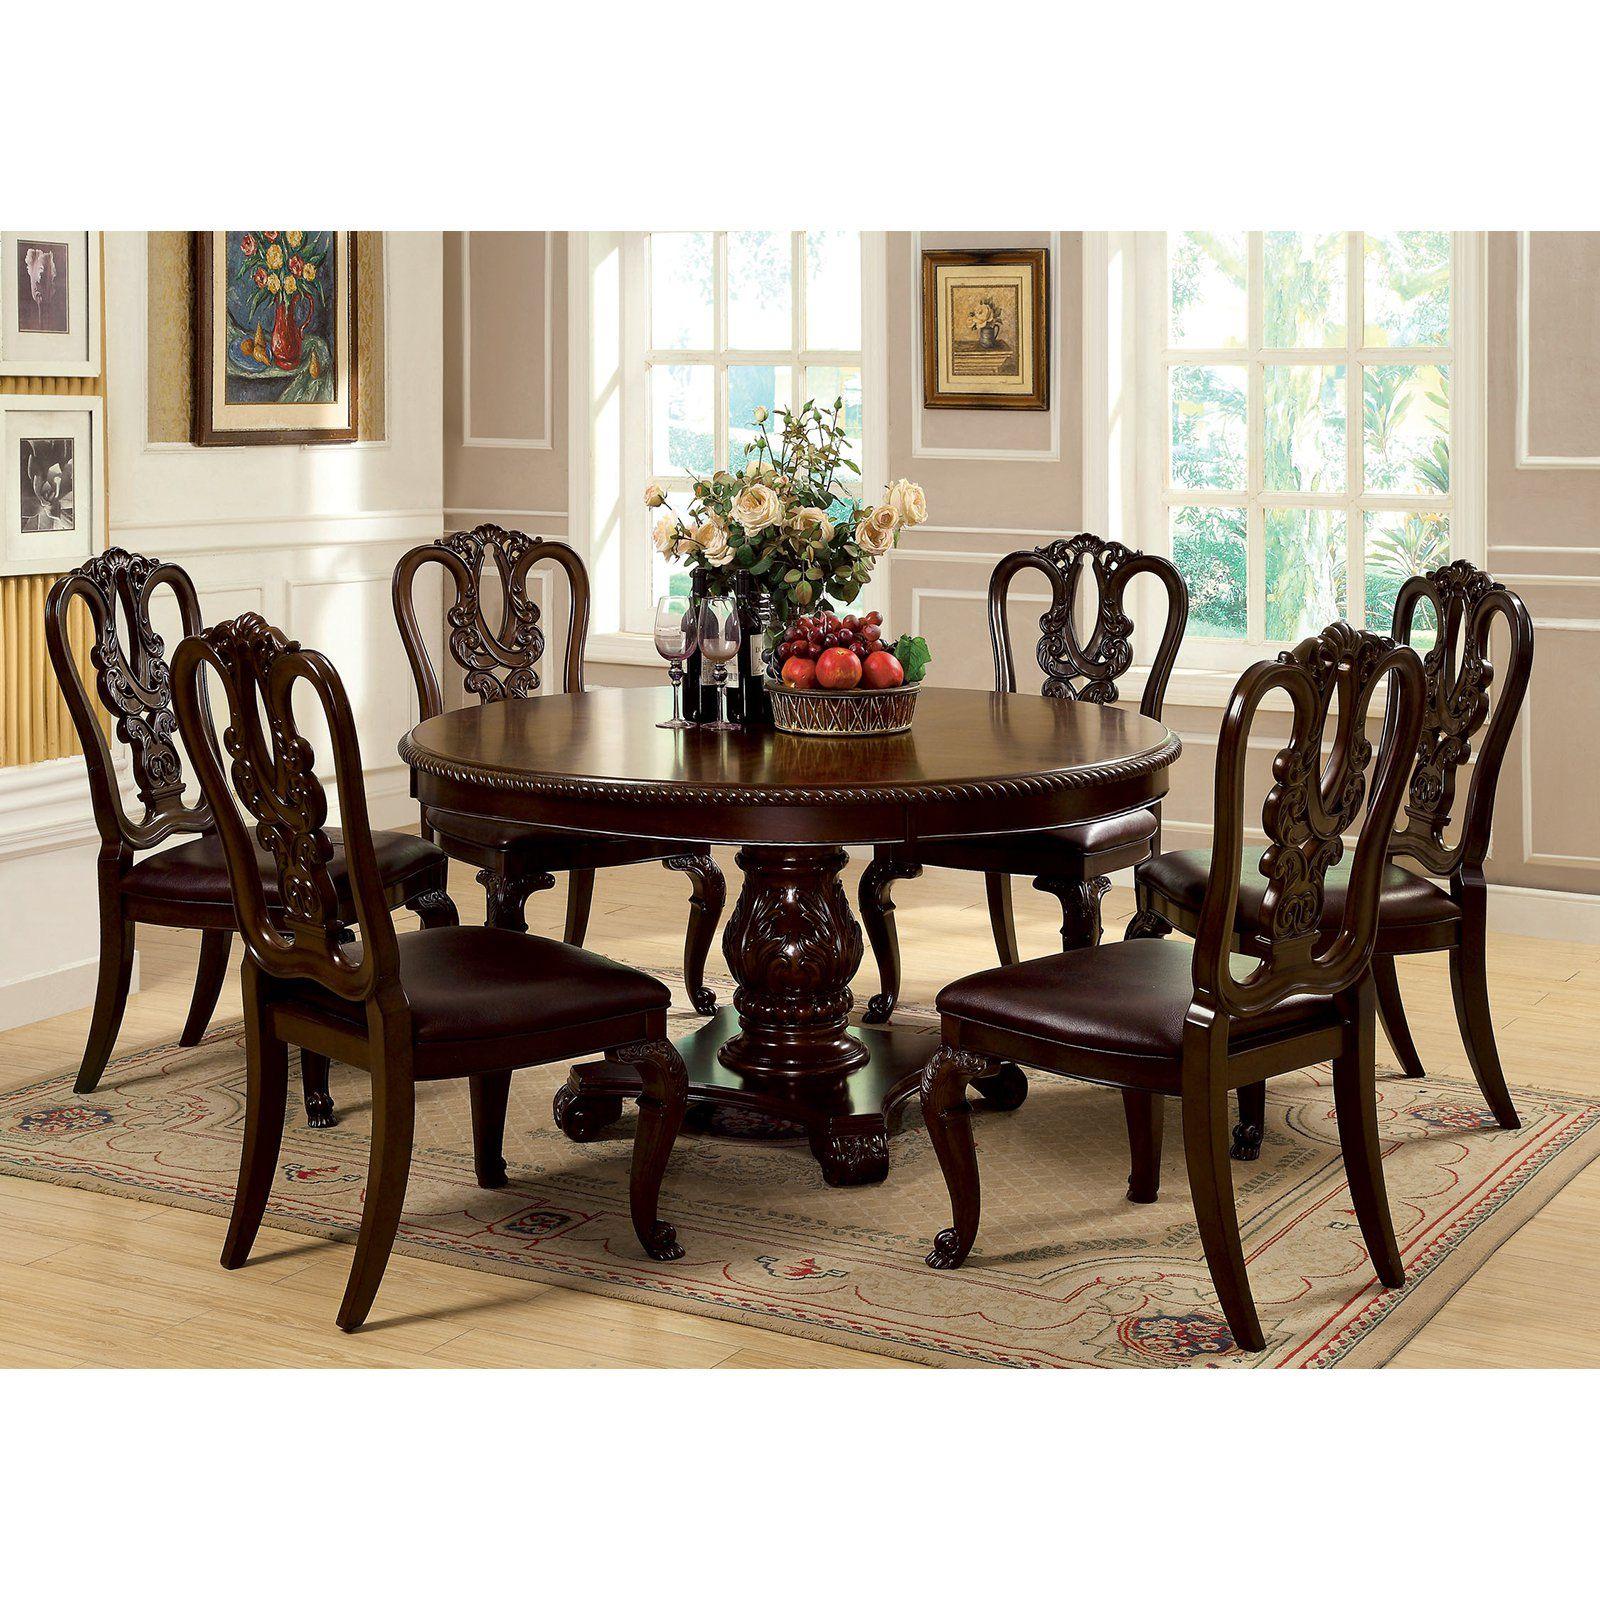 furniture of america berkshire 7 piece round dining set with wooden rh pinterest com